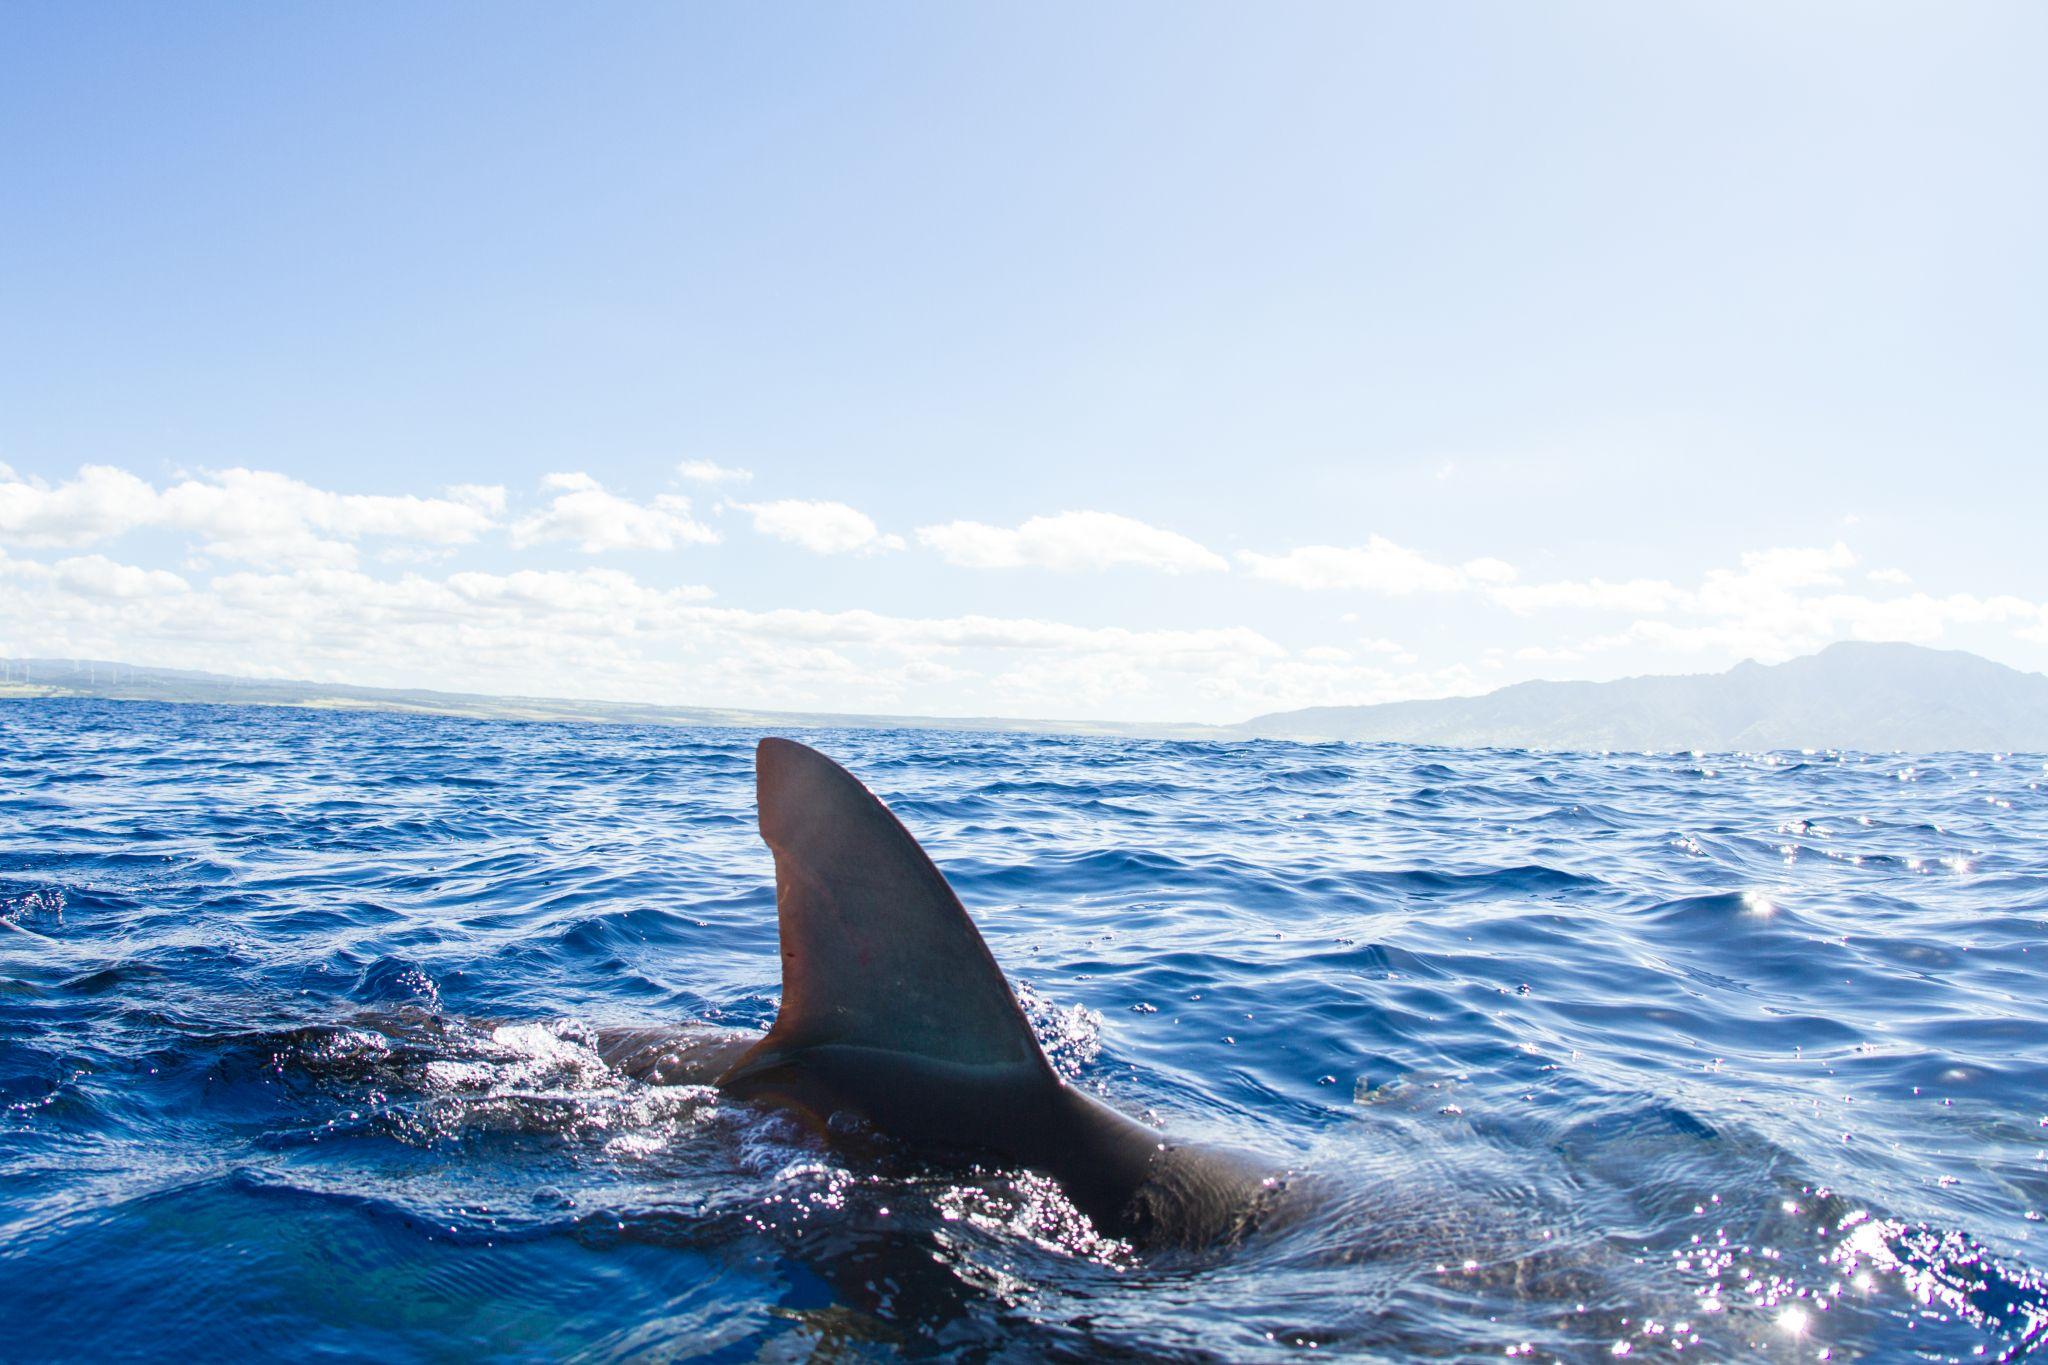 Snorkelers caught in rare shark 'feeding frenzy'...